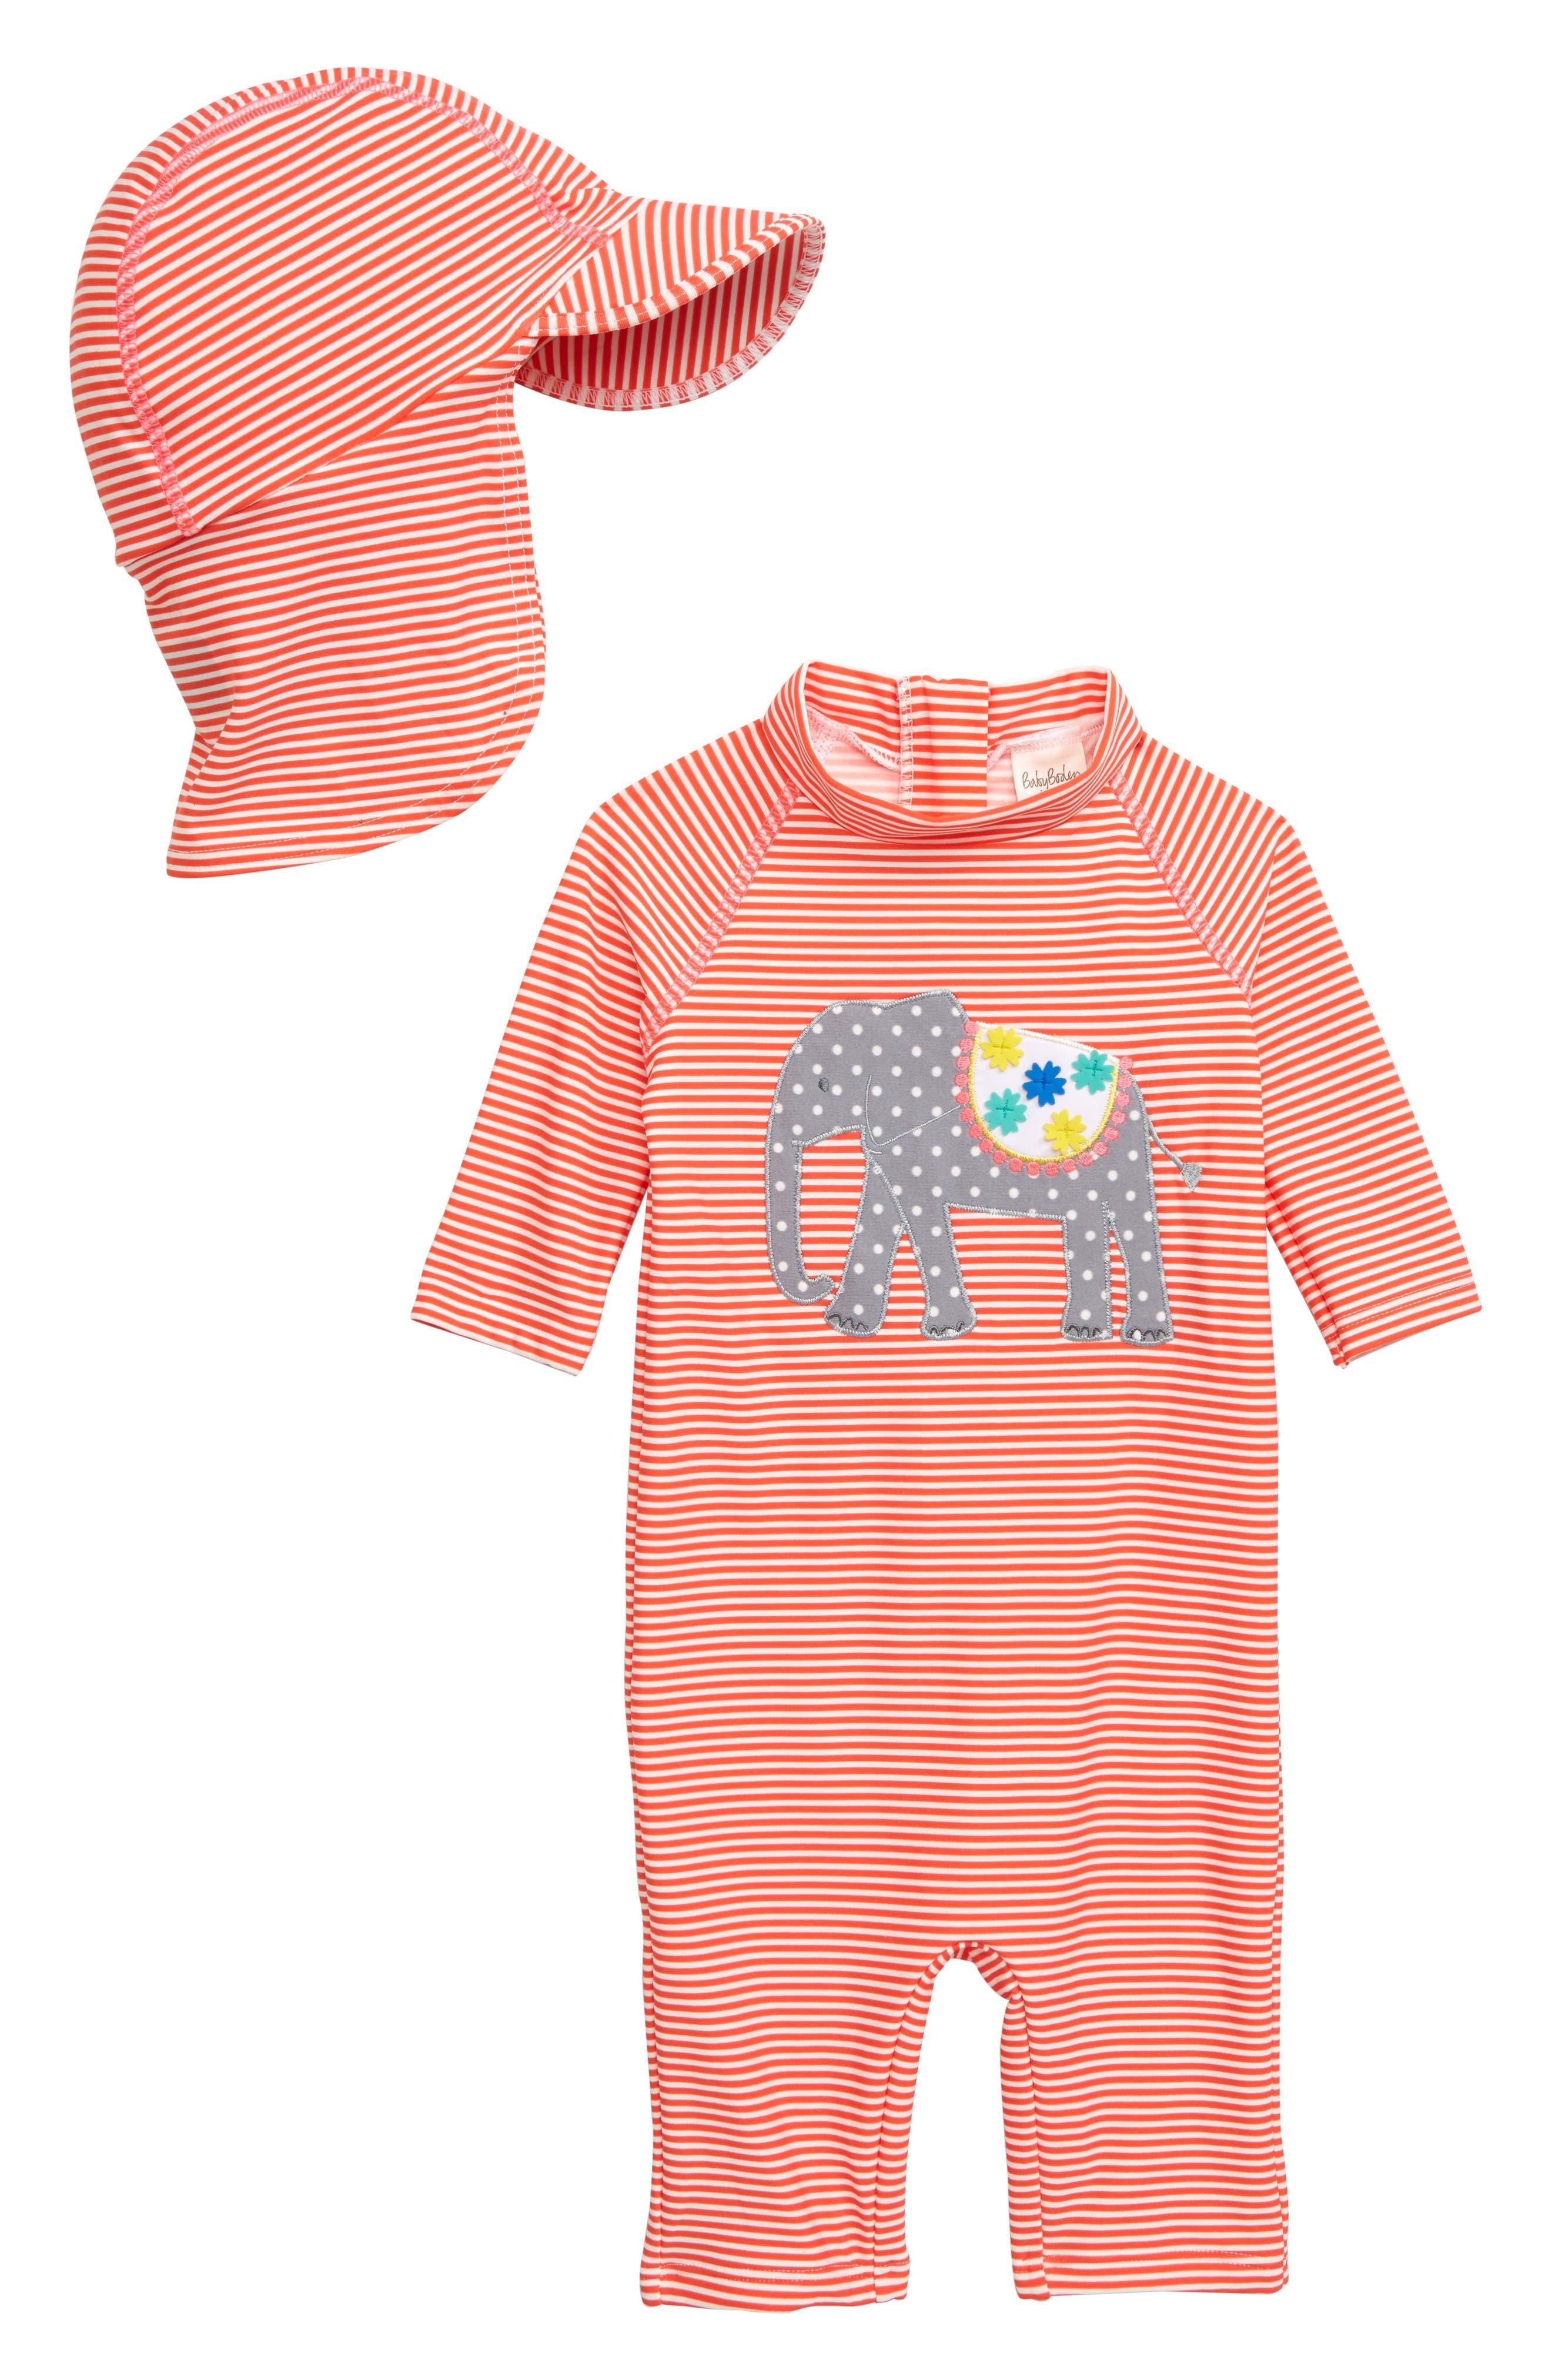 c2eb7fe650 Infant Girl's Mini Boden Jungle Surf One-Piece Rashguard & Sun Hat Set, 8-2  - Red